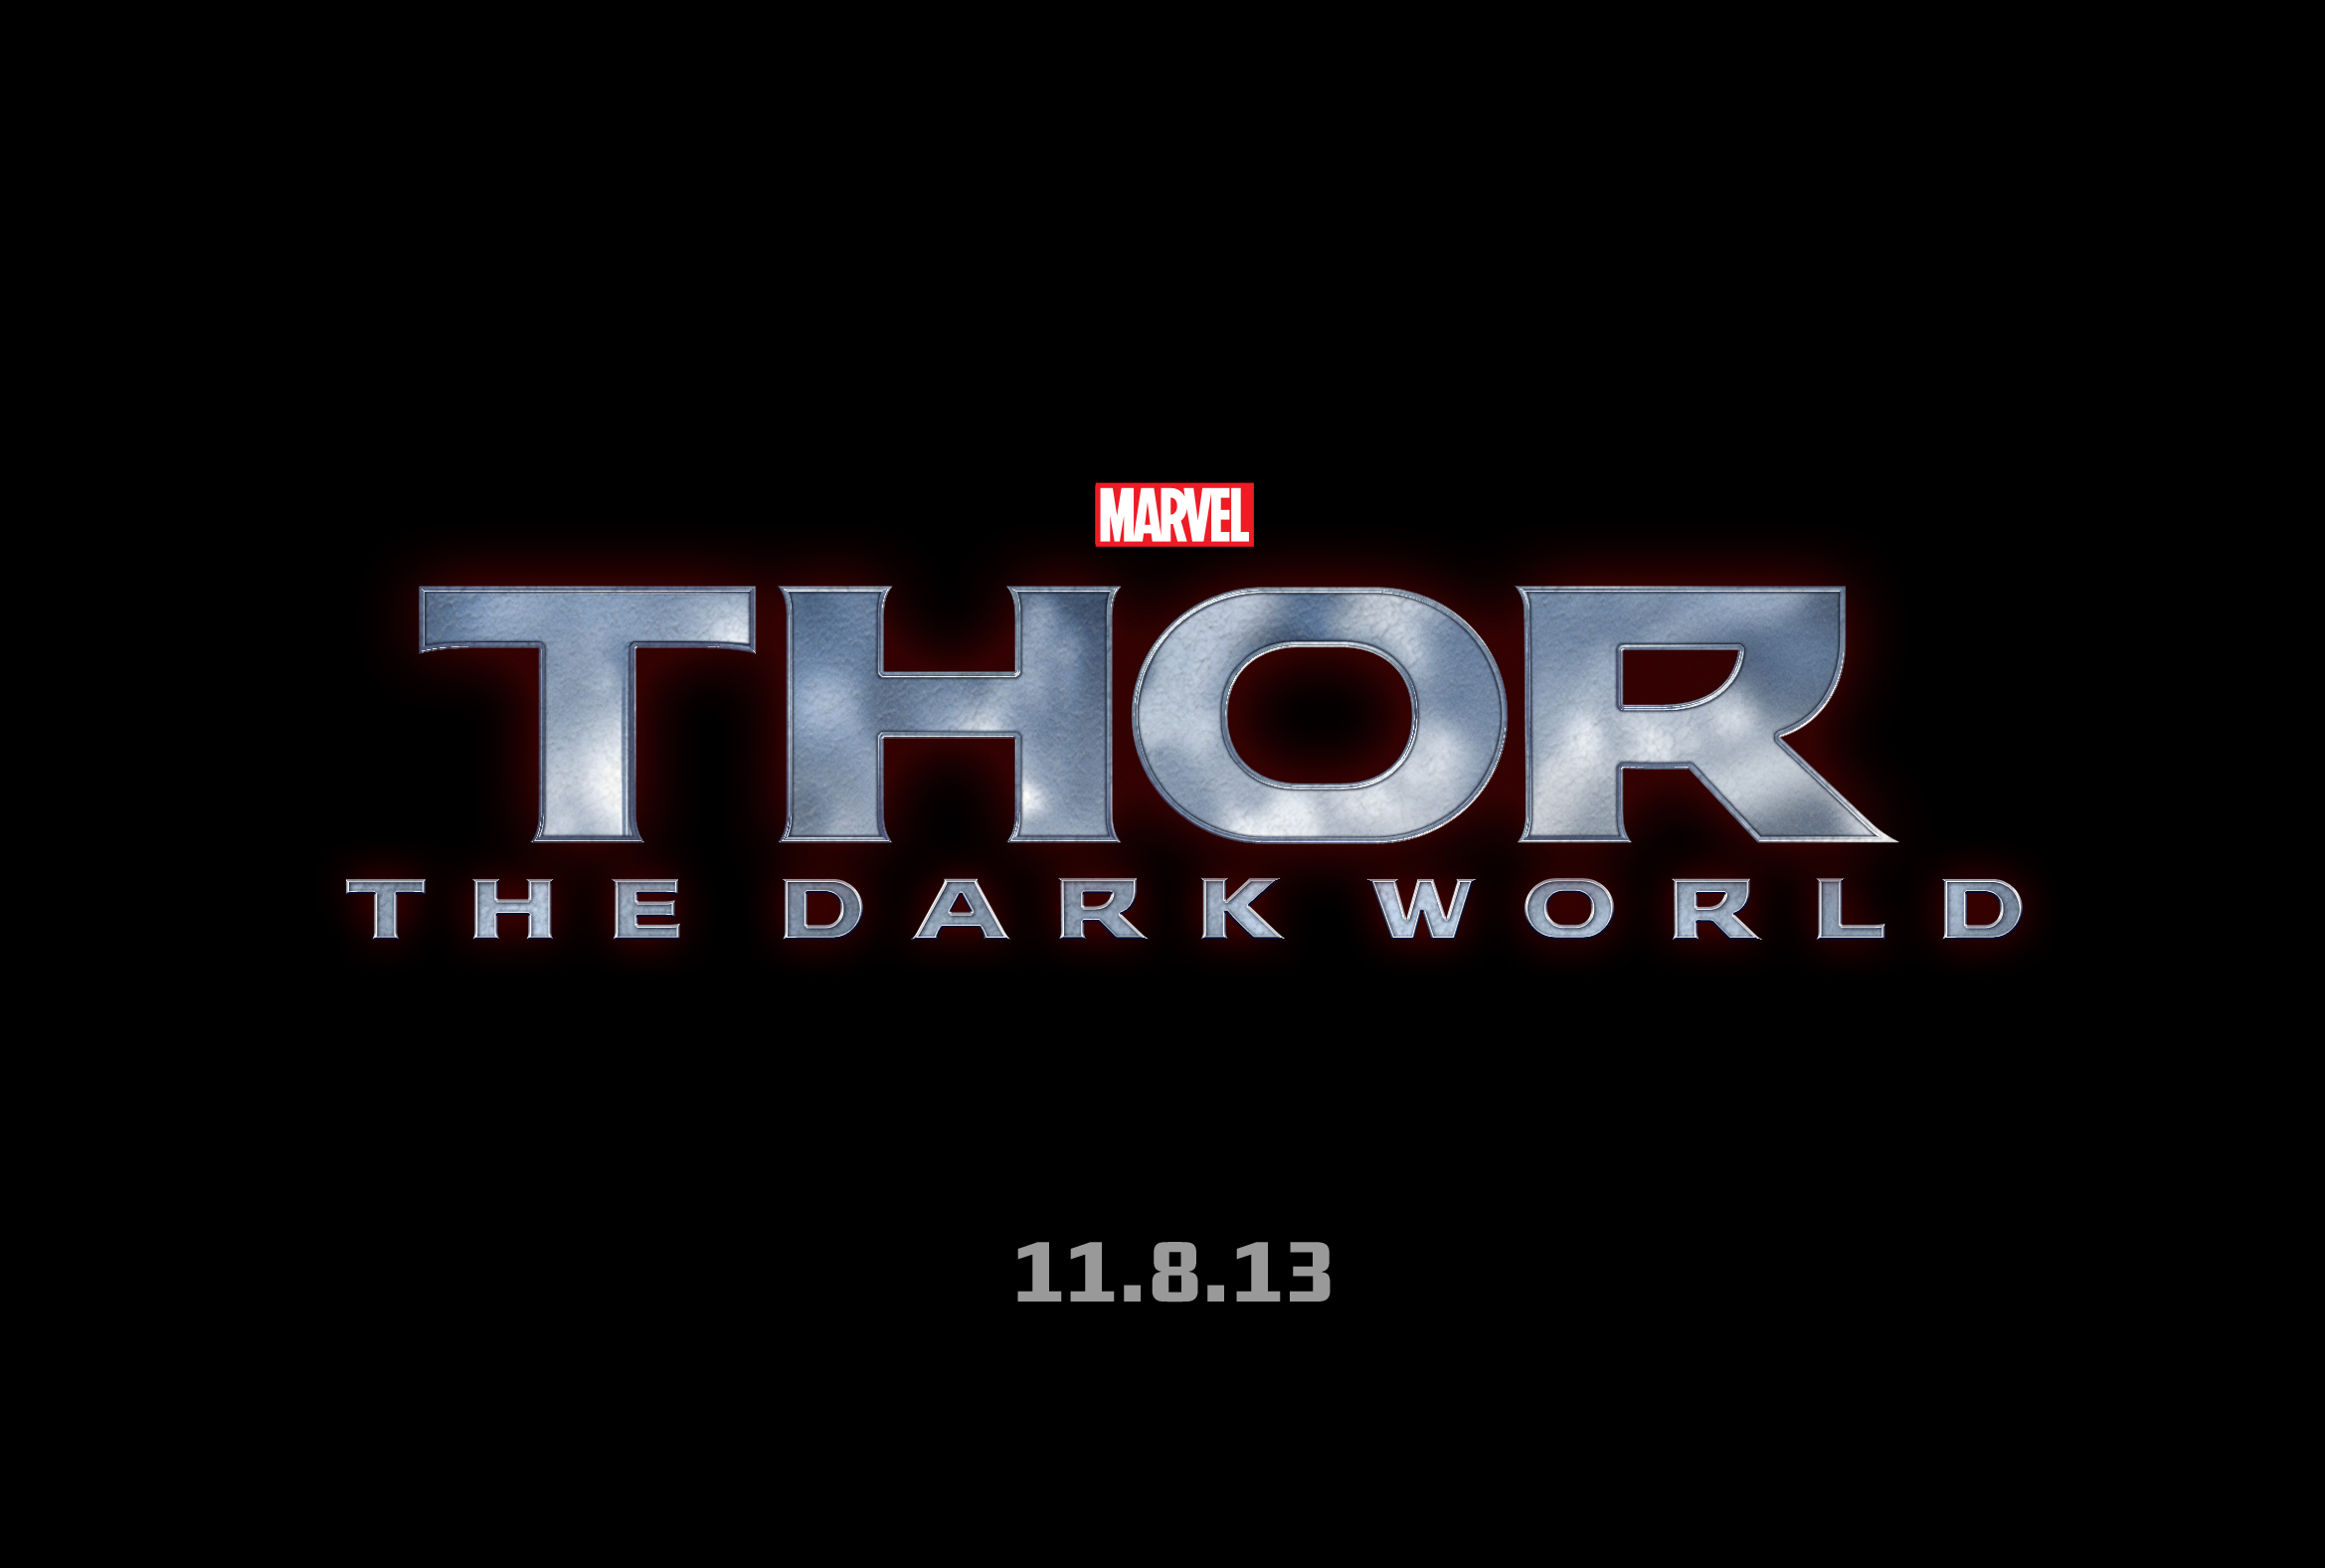 thor 2 dark world logo